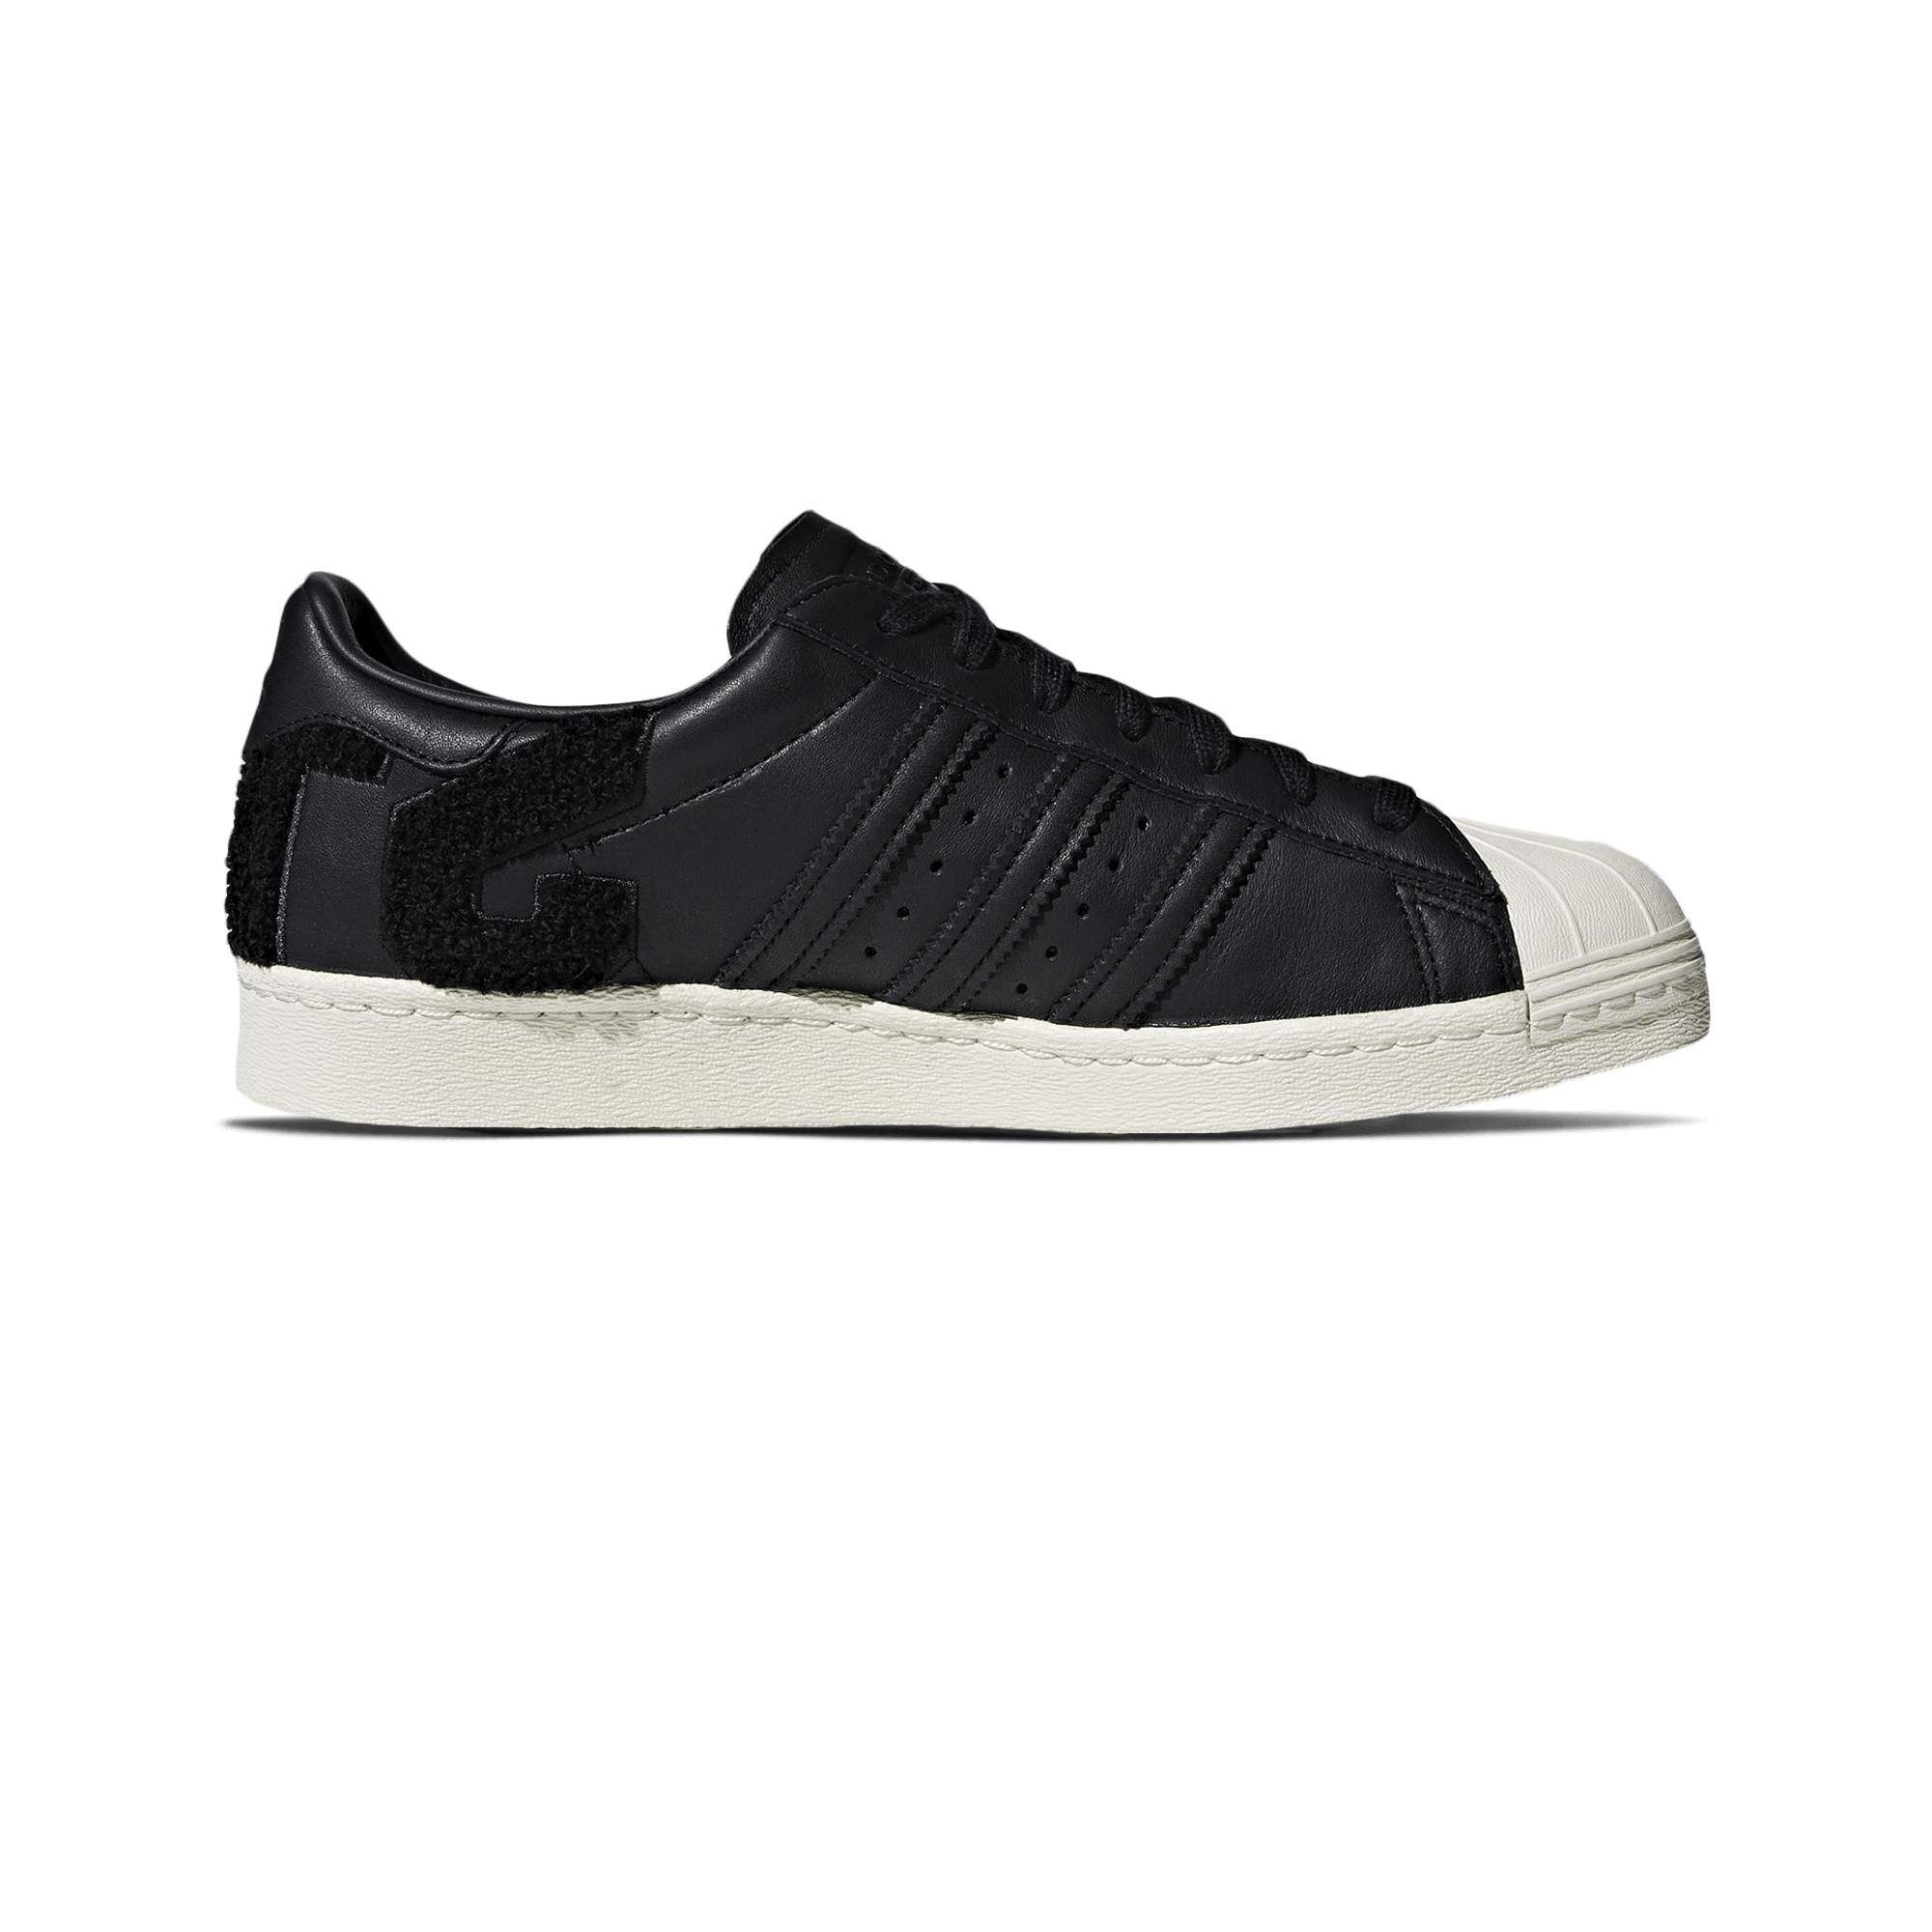 Superstar 80s core black / off white